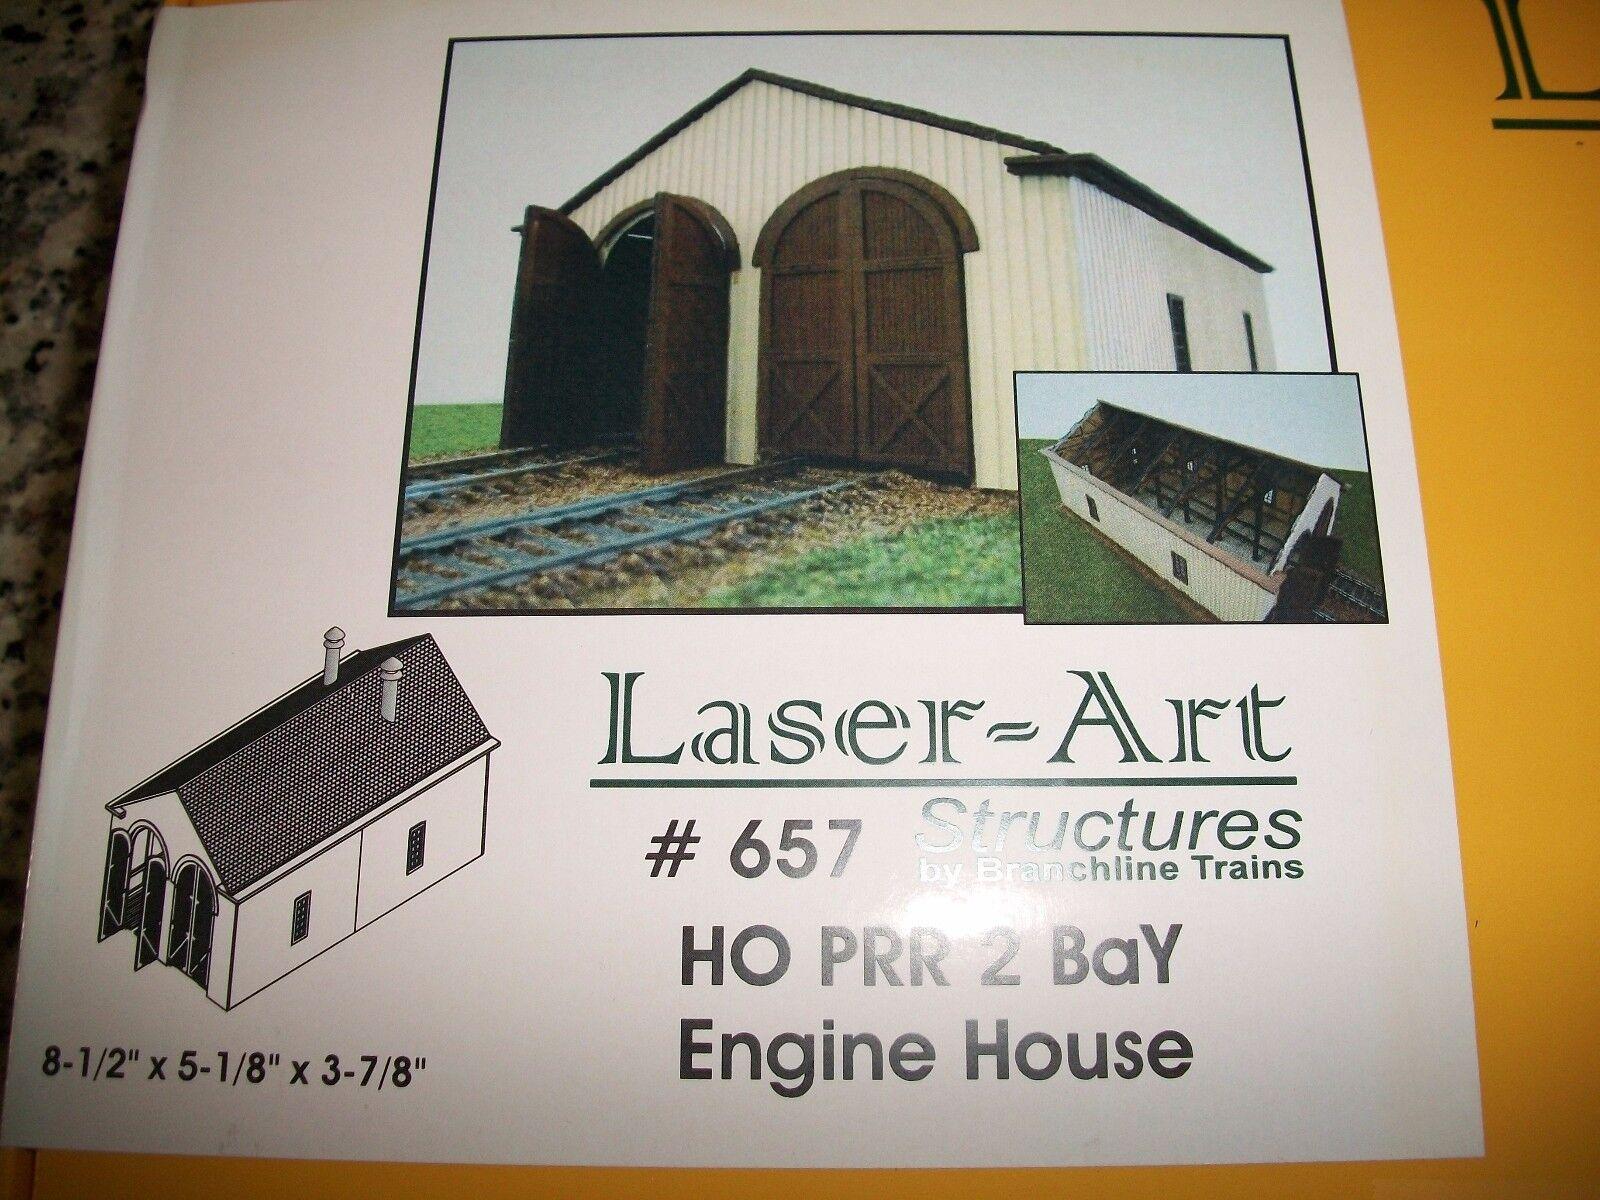 Branchline Laser Art Kit HO Scale PRR 2 Bay Engine House   657 Bob The Train Guy